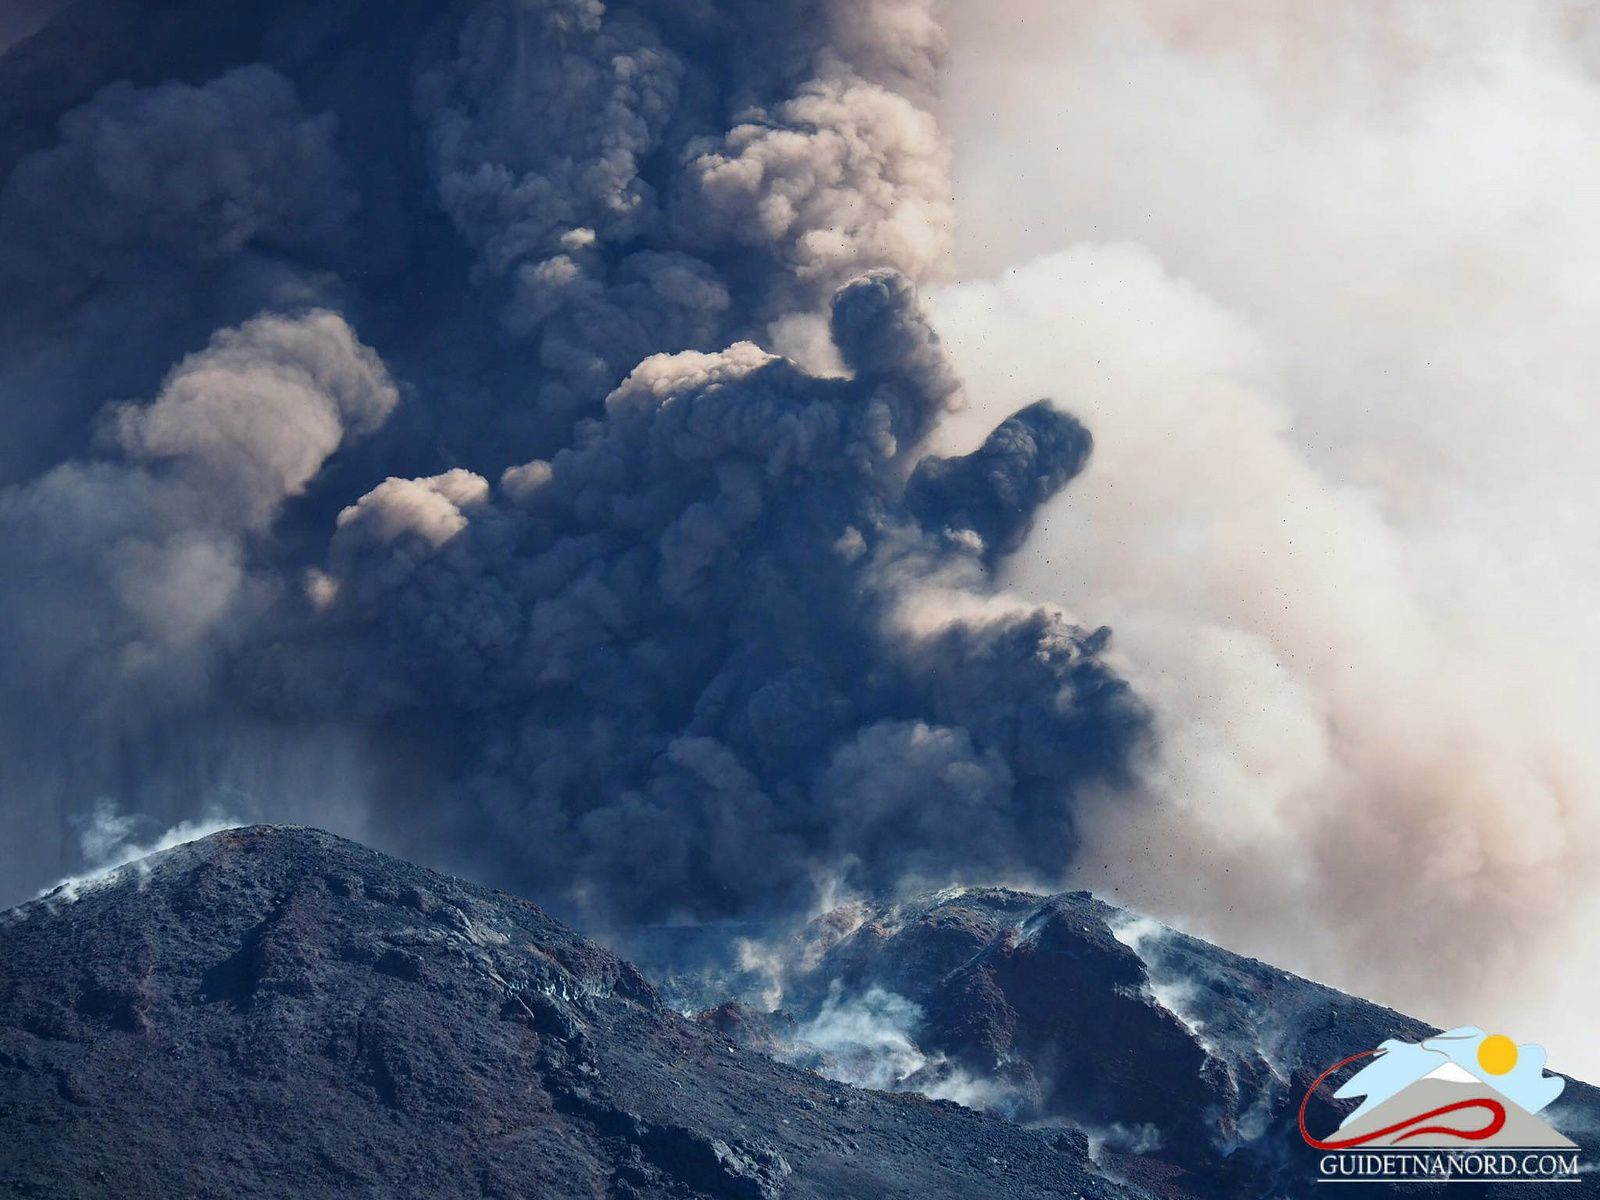 Etna - 24.08.2018 - photo Gruppo Guide Alpine e Vulcanologiche Etna Nord